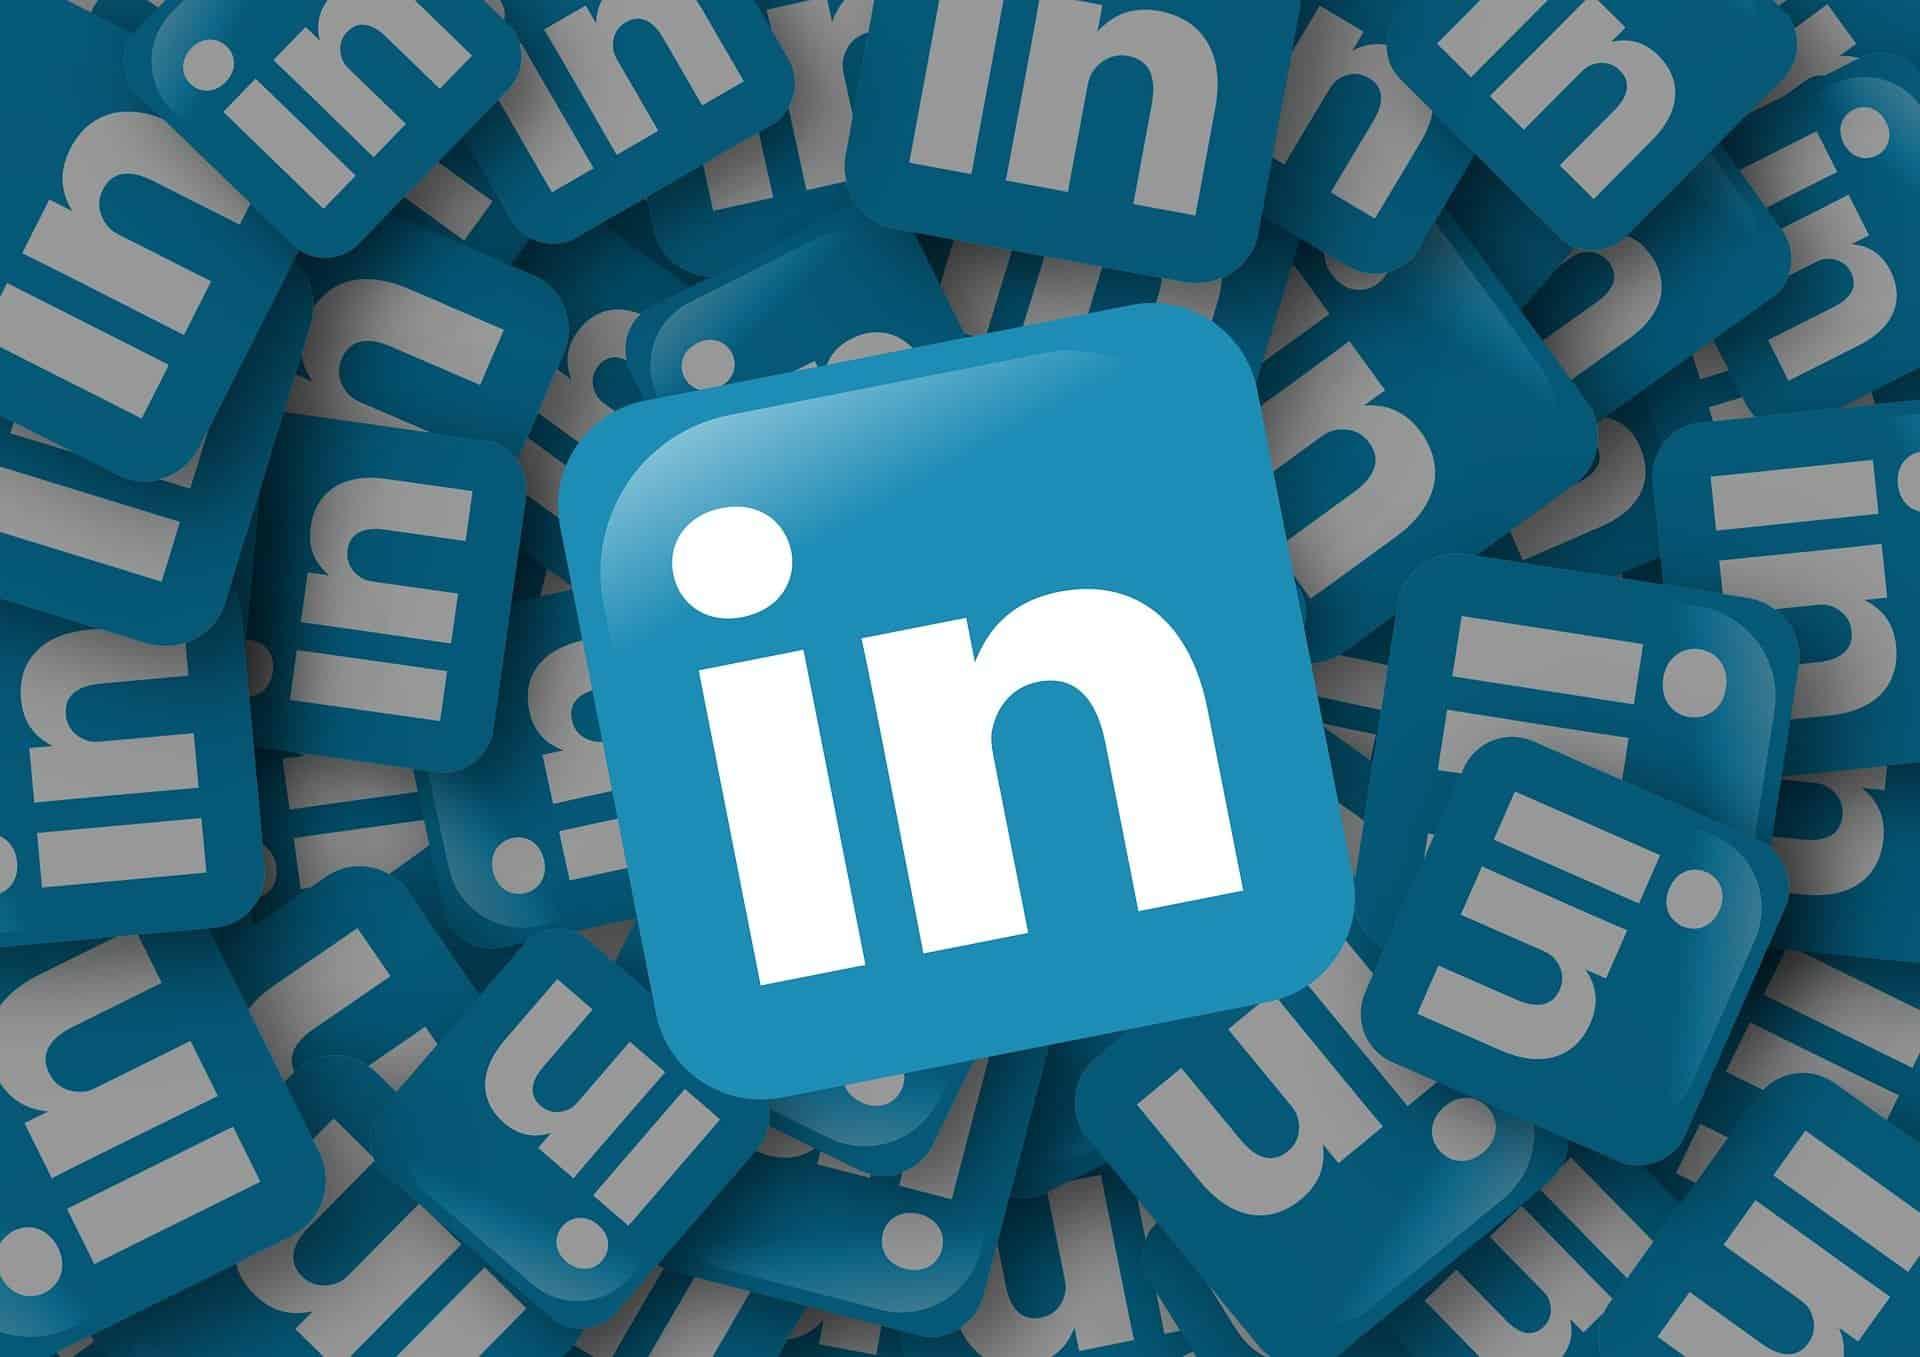 Top 10 LinkedIn Marketing Hacks to Grow Your Business